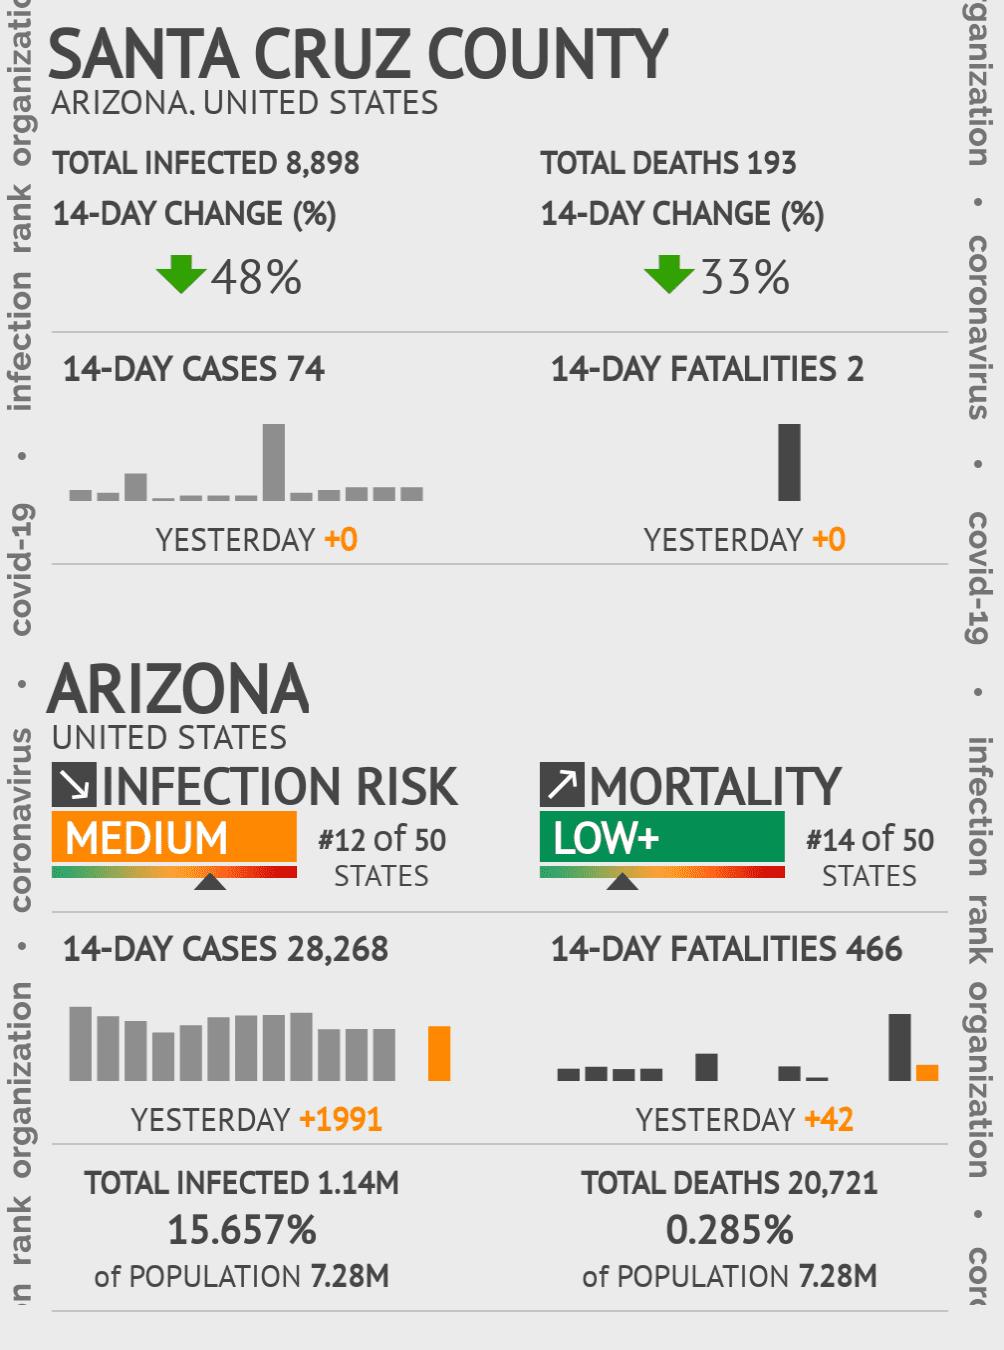 Santa Cruz County Coronavirus Covid-19 Risk of Infection on July 24, 2021